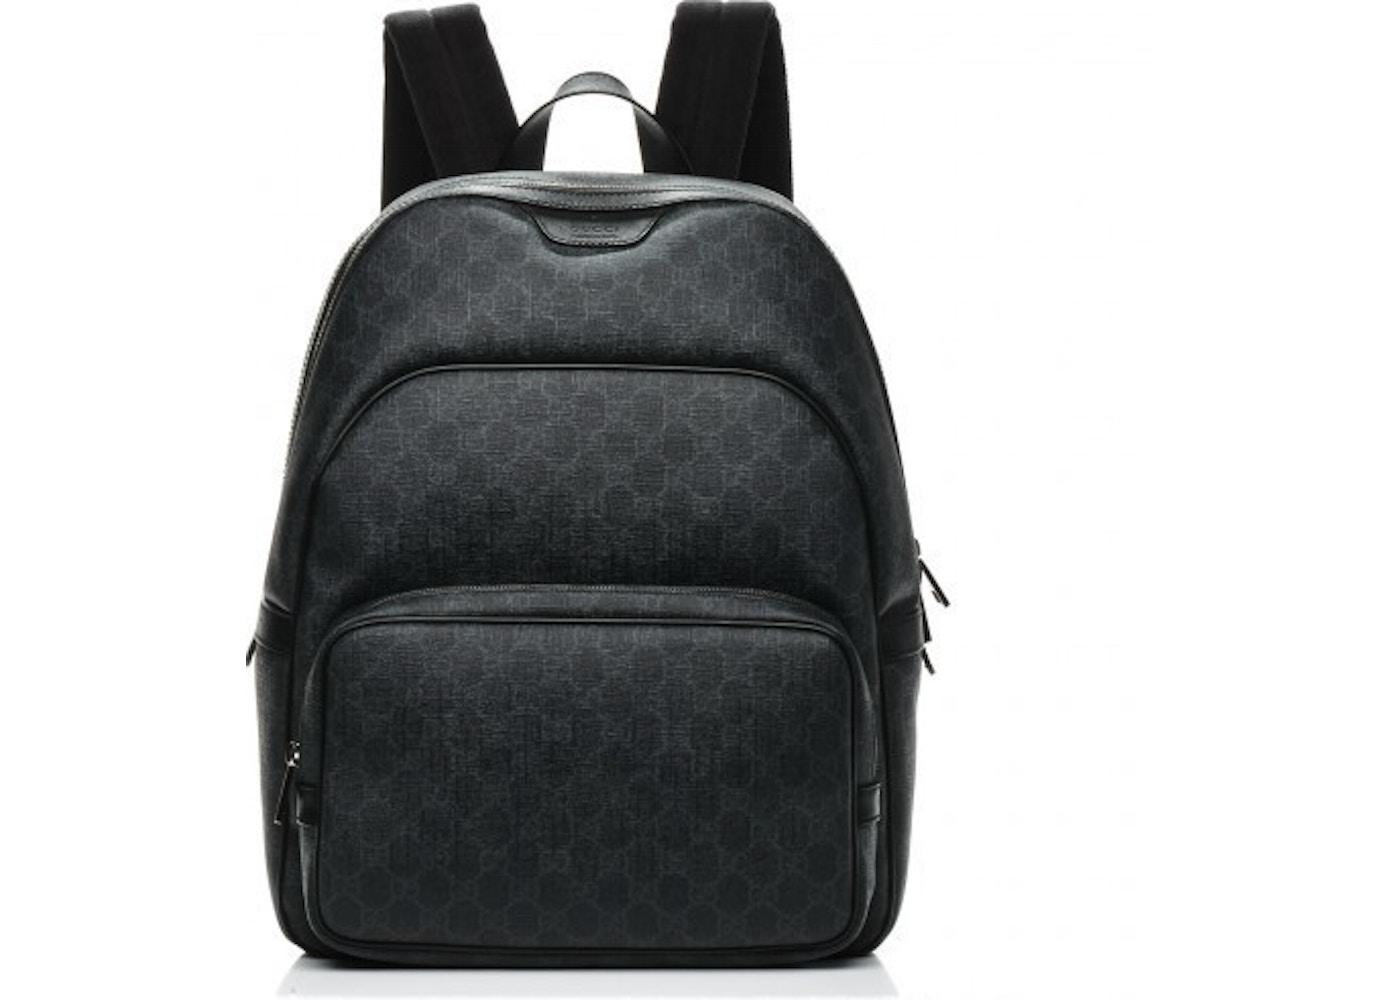 ... designer fashion 9741d 8c849 Gucci GG Supreme Backpack Monogram GG  Medium Black ... 9ce772aea1